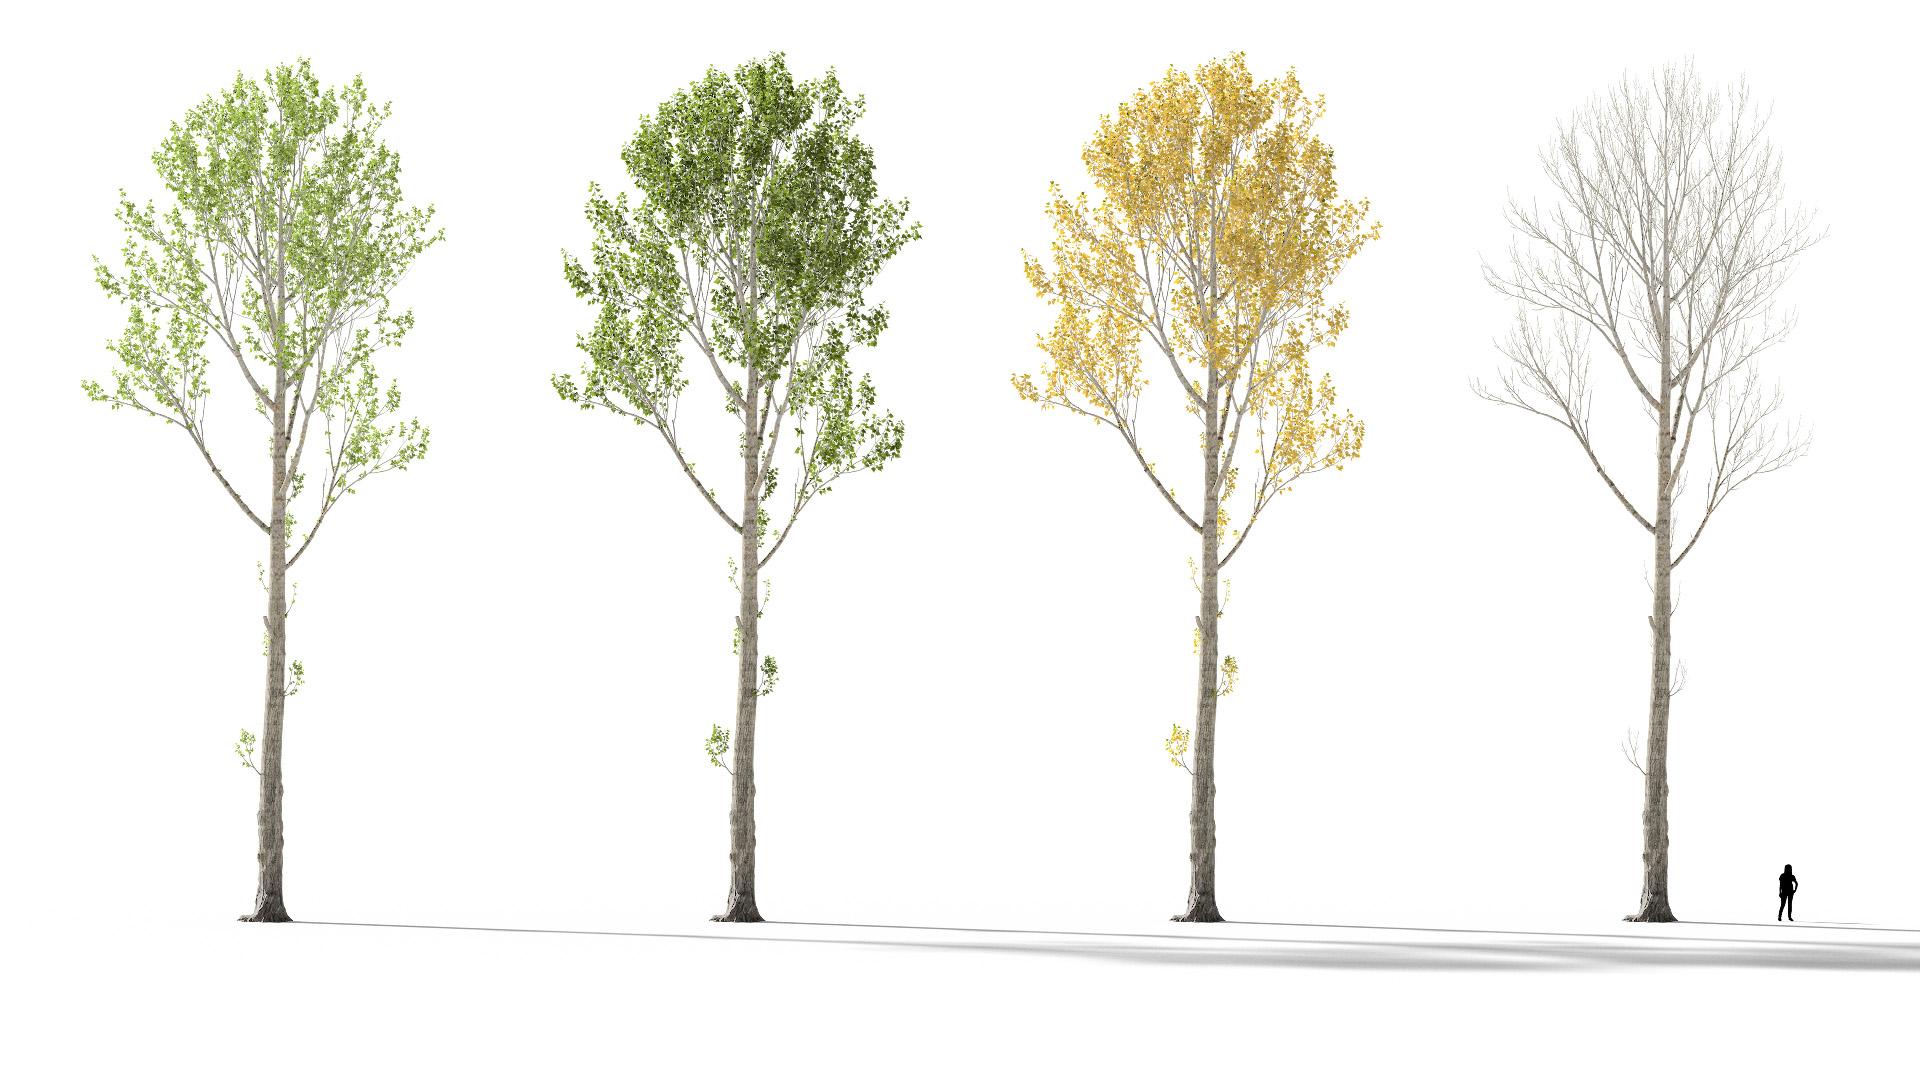 3D model of the Black poplar Populus nigra season variations